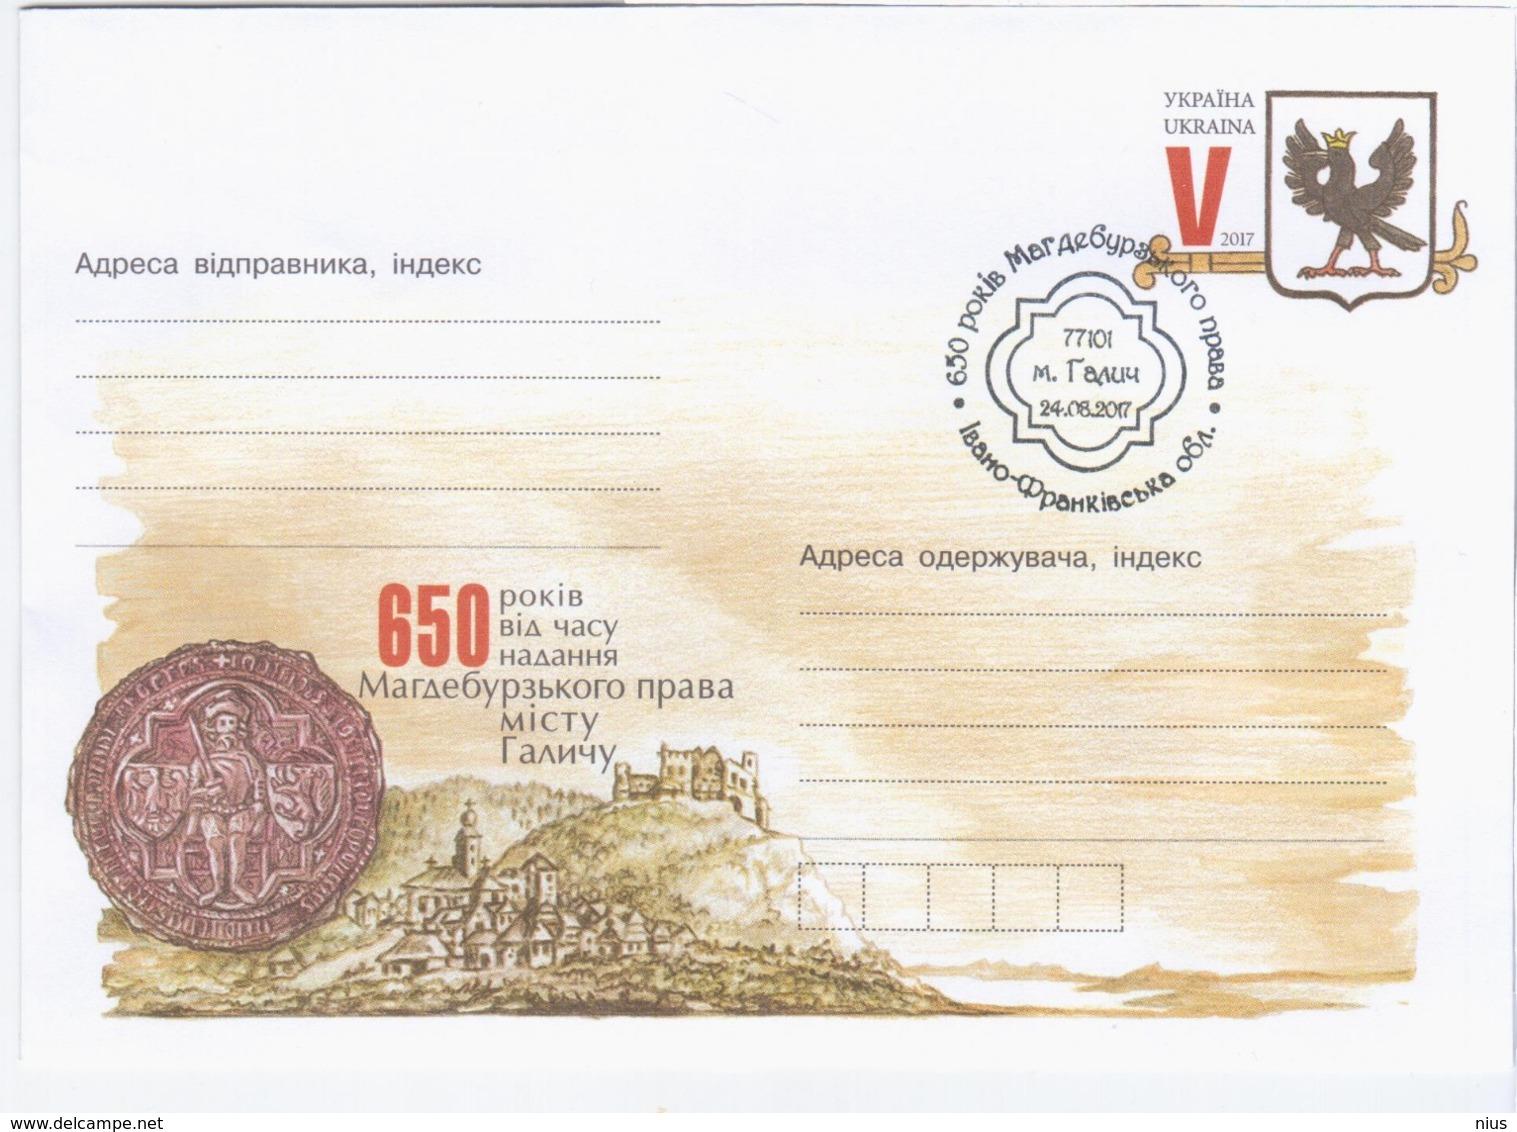 Ukraine 2017 Halych Or Galich, Ivano-Frankivsk Oblast - Ukraine